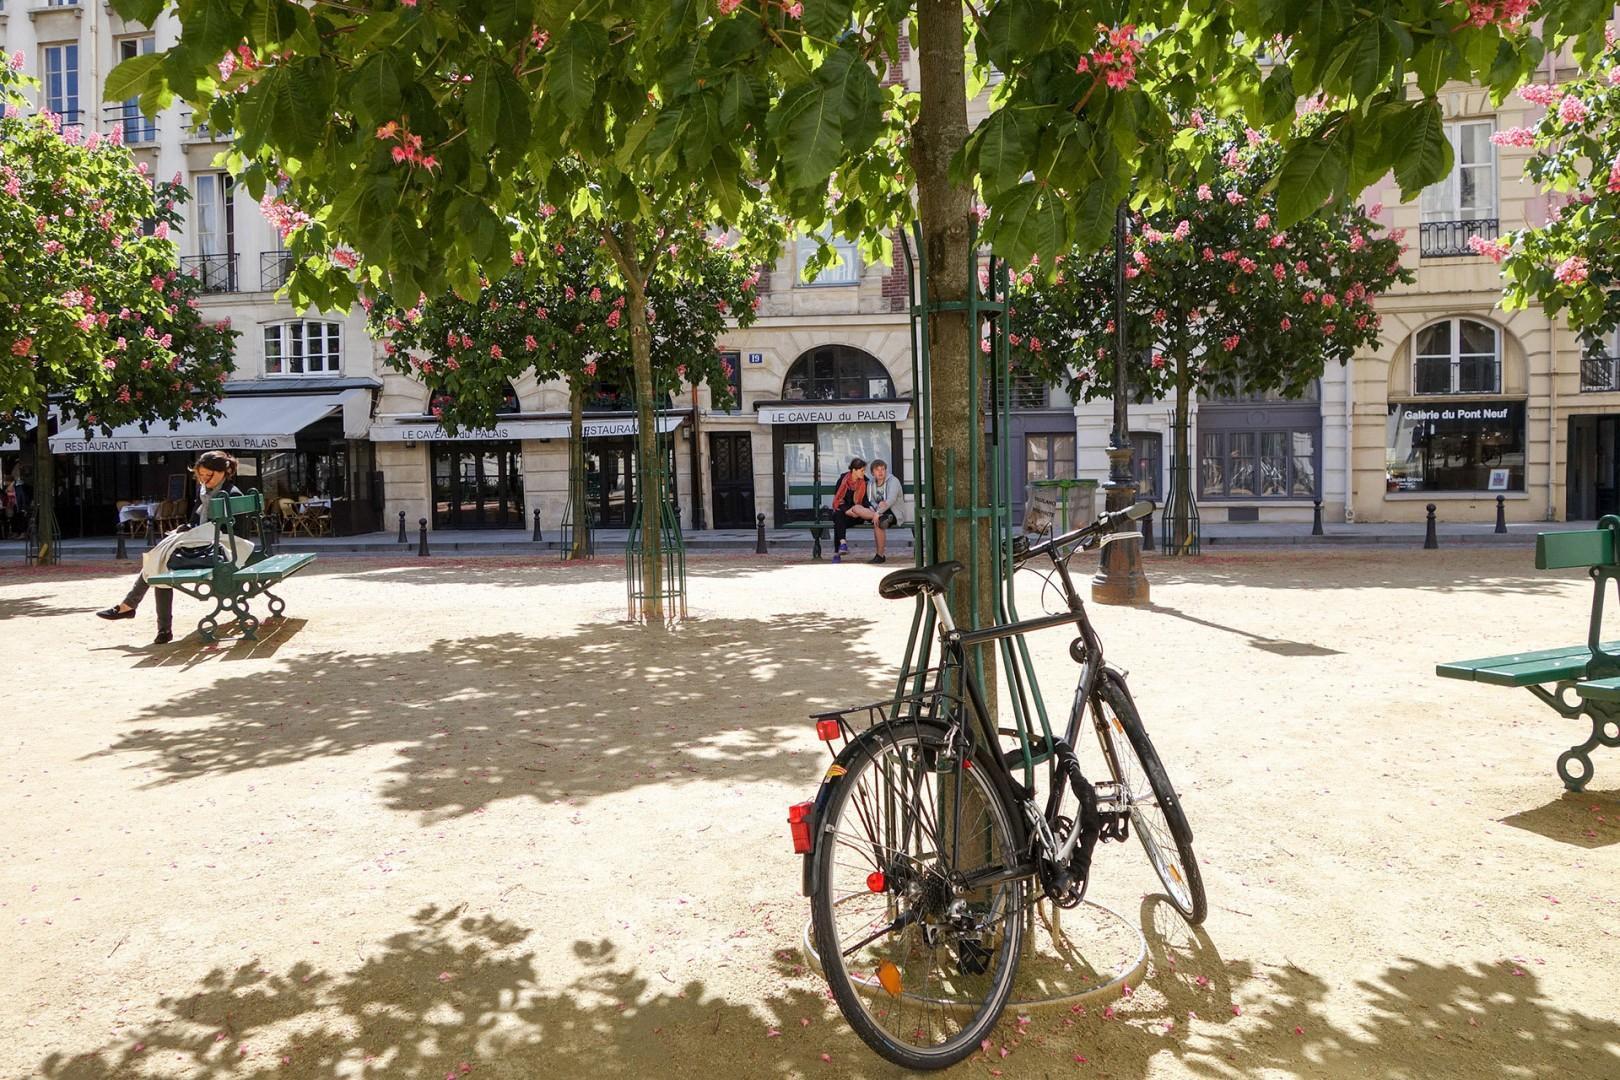 12-place-dauphine-bike-beneath-trees